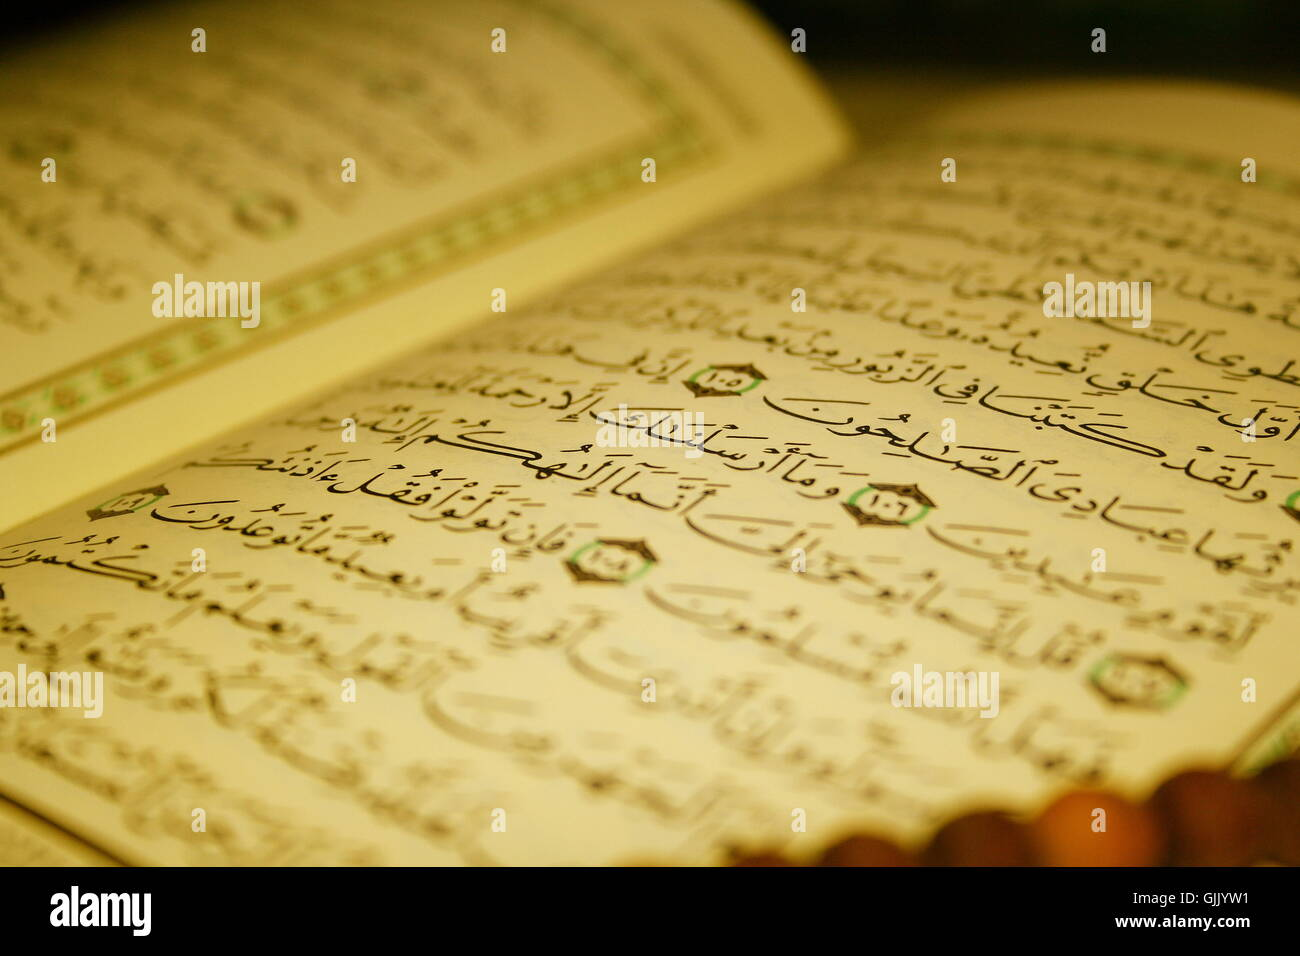 islam koran book - Stock Image